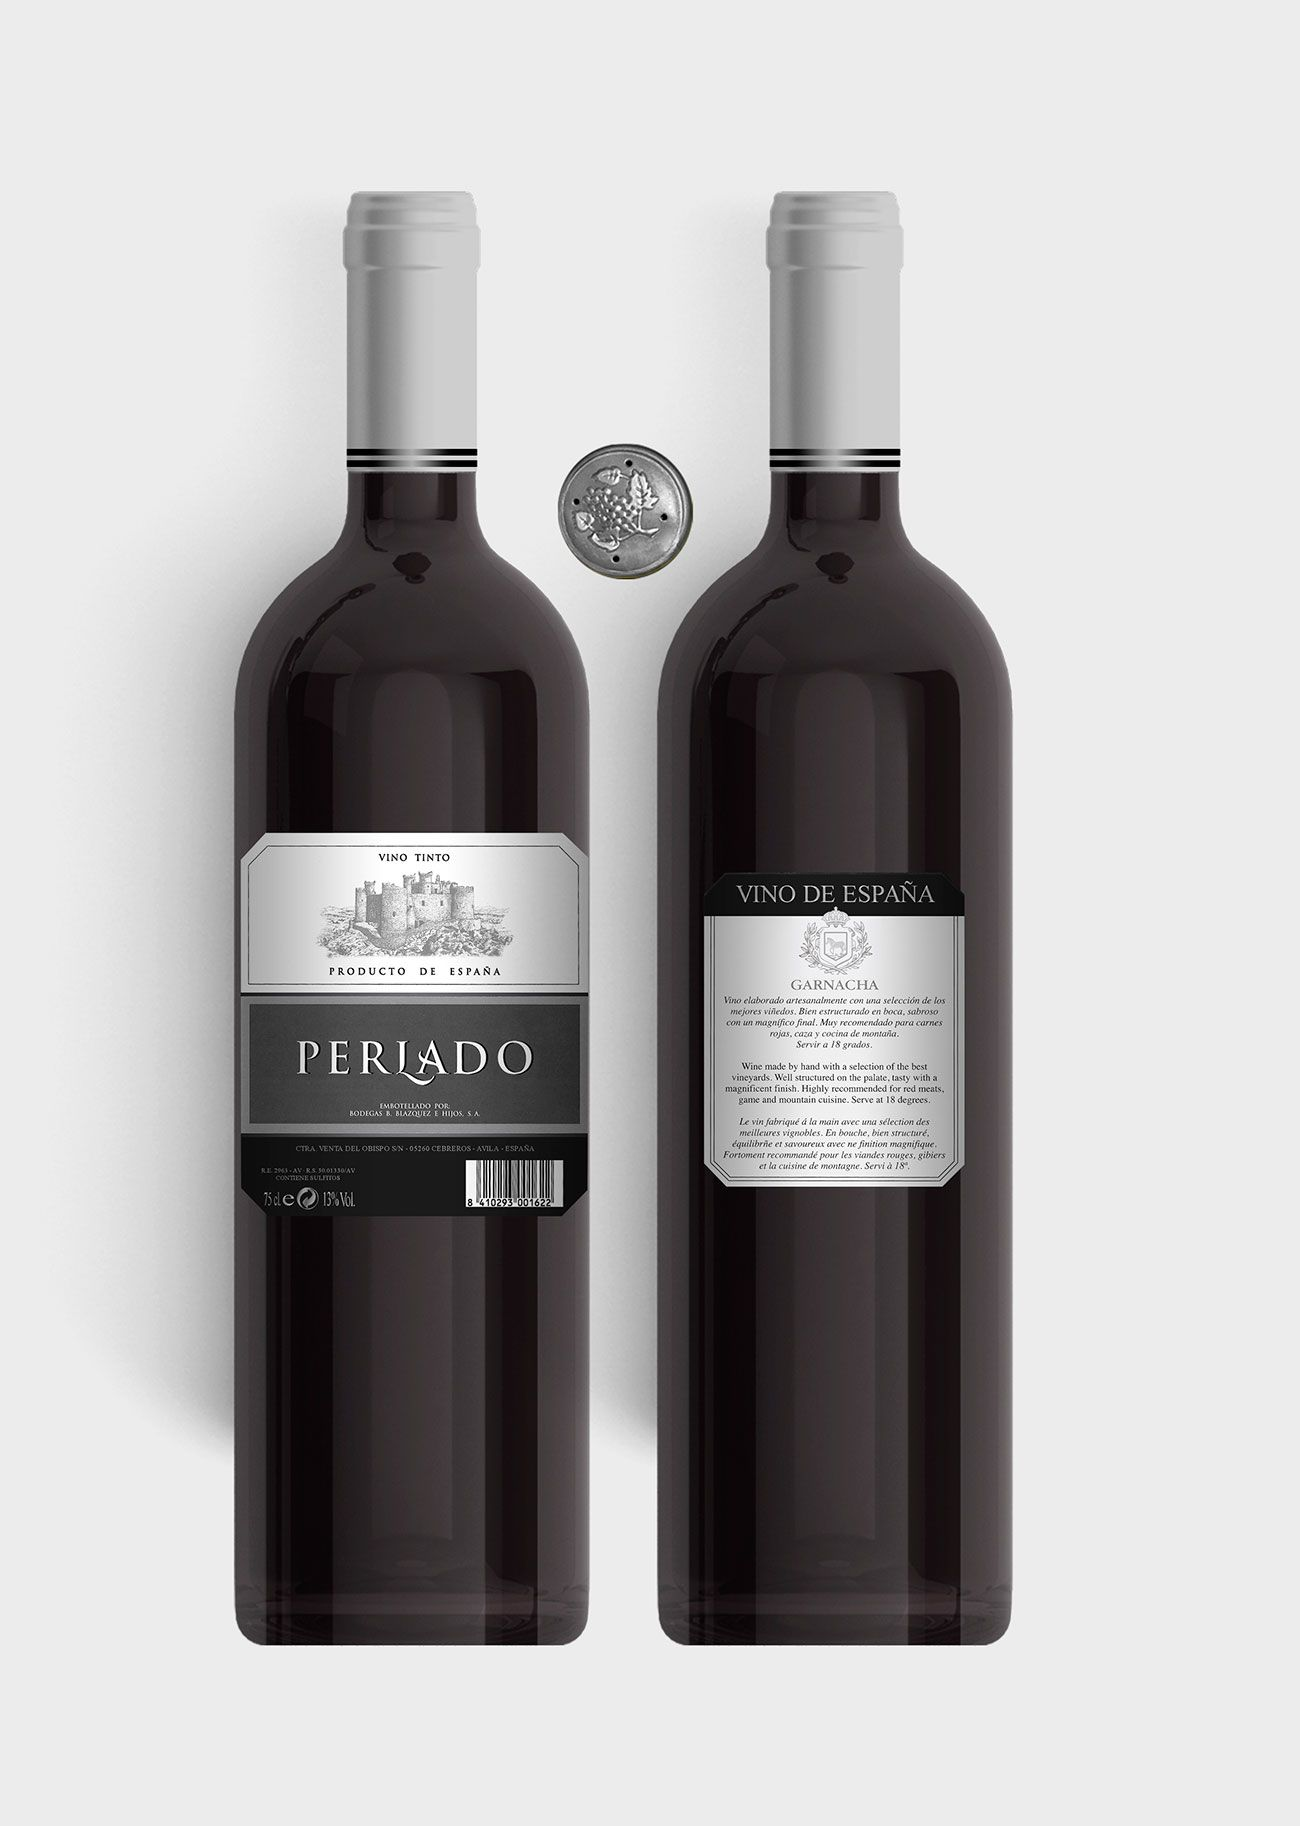 Benito Blázquez - Botella de Vino Tinto Perlado Plata